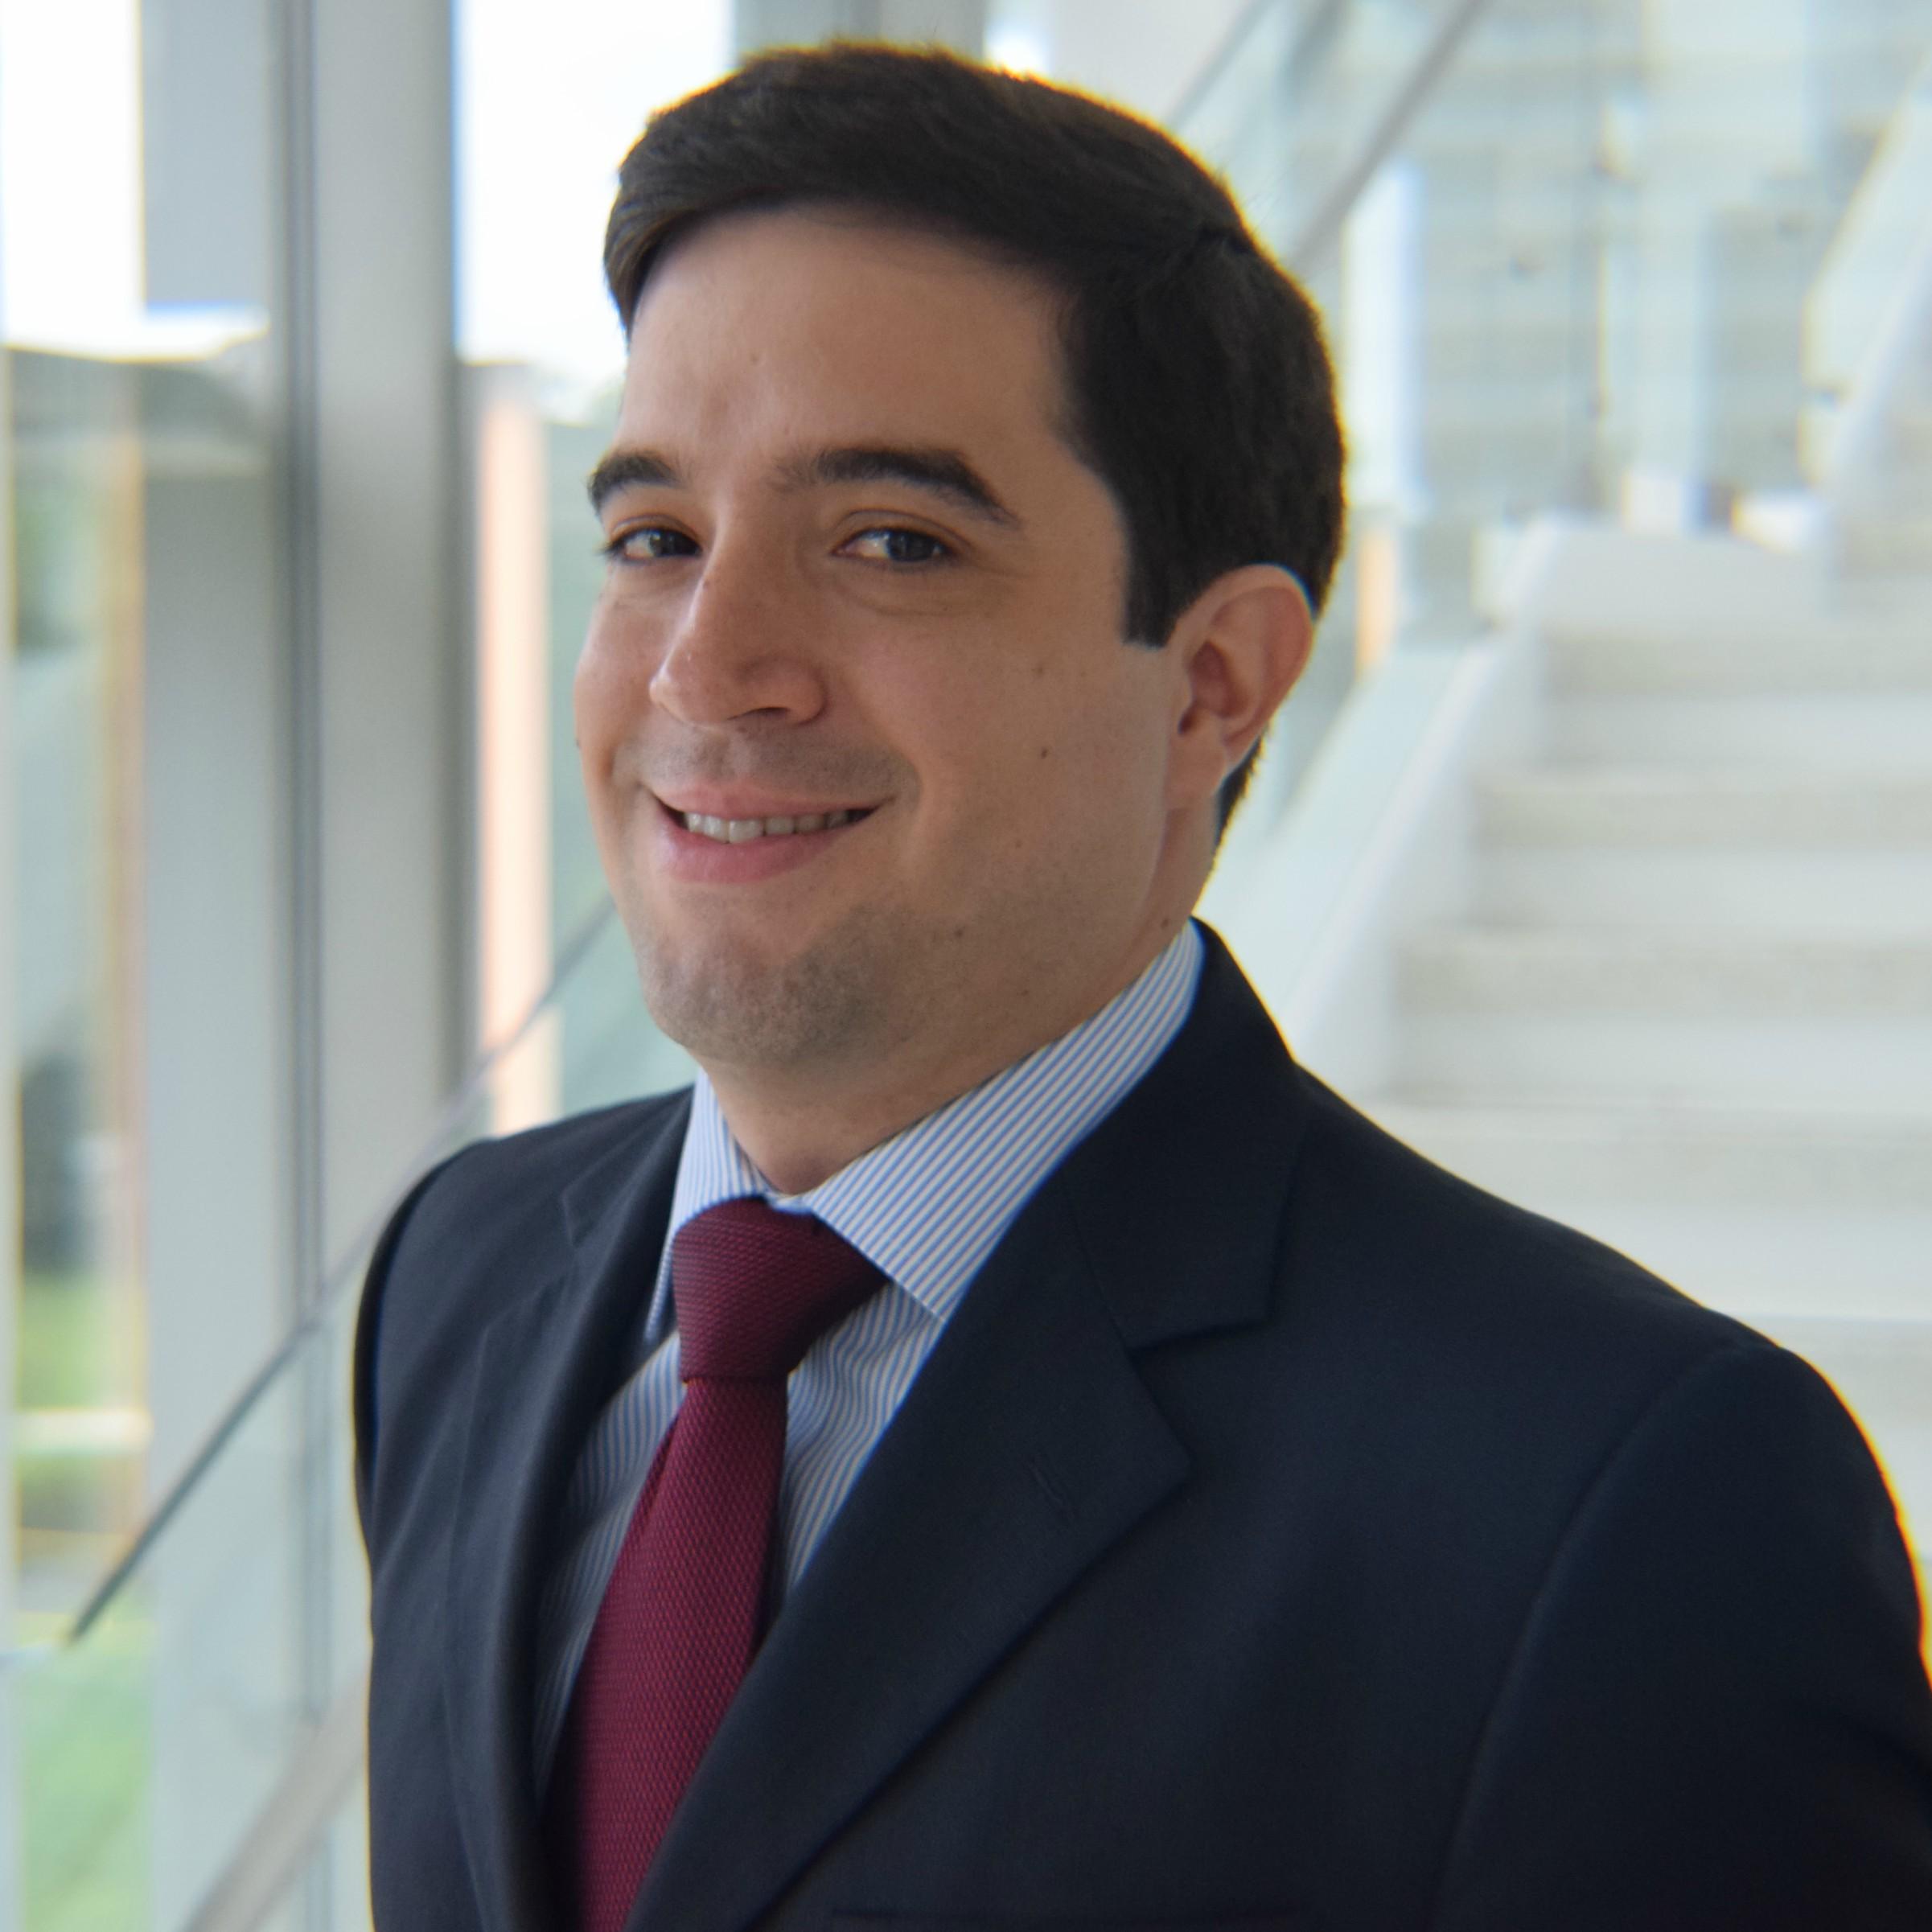 Lucas Martínez-Villalba